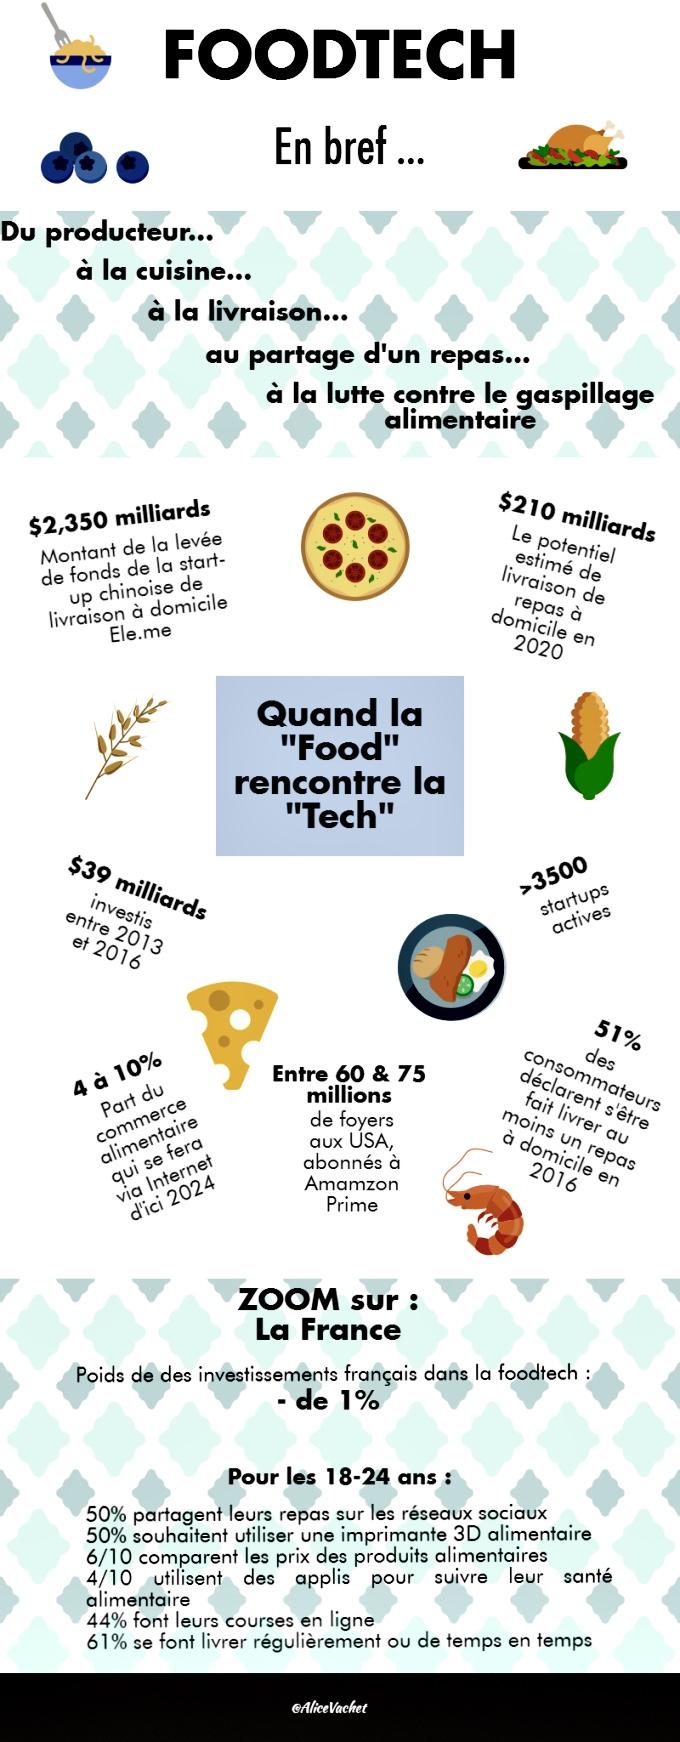 [Infographie] La FoodTech : en bref🥯